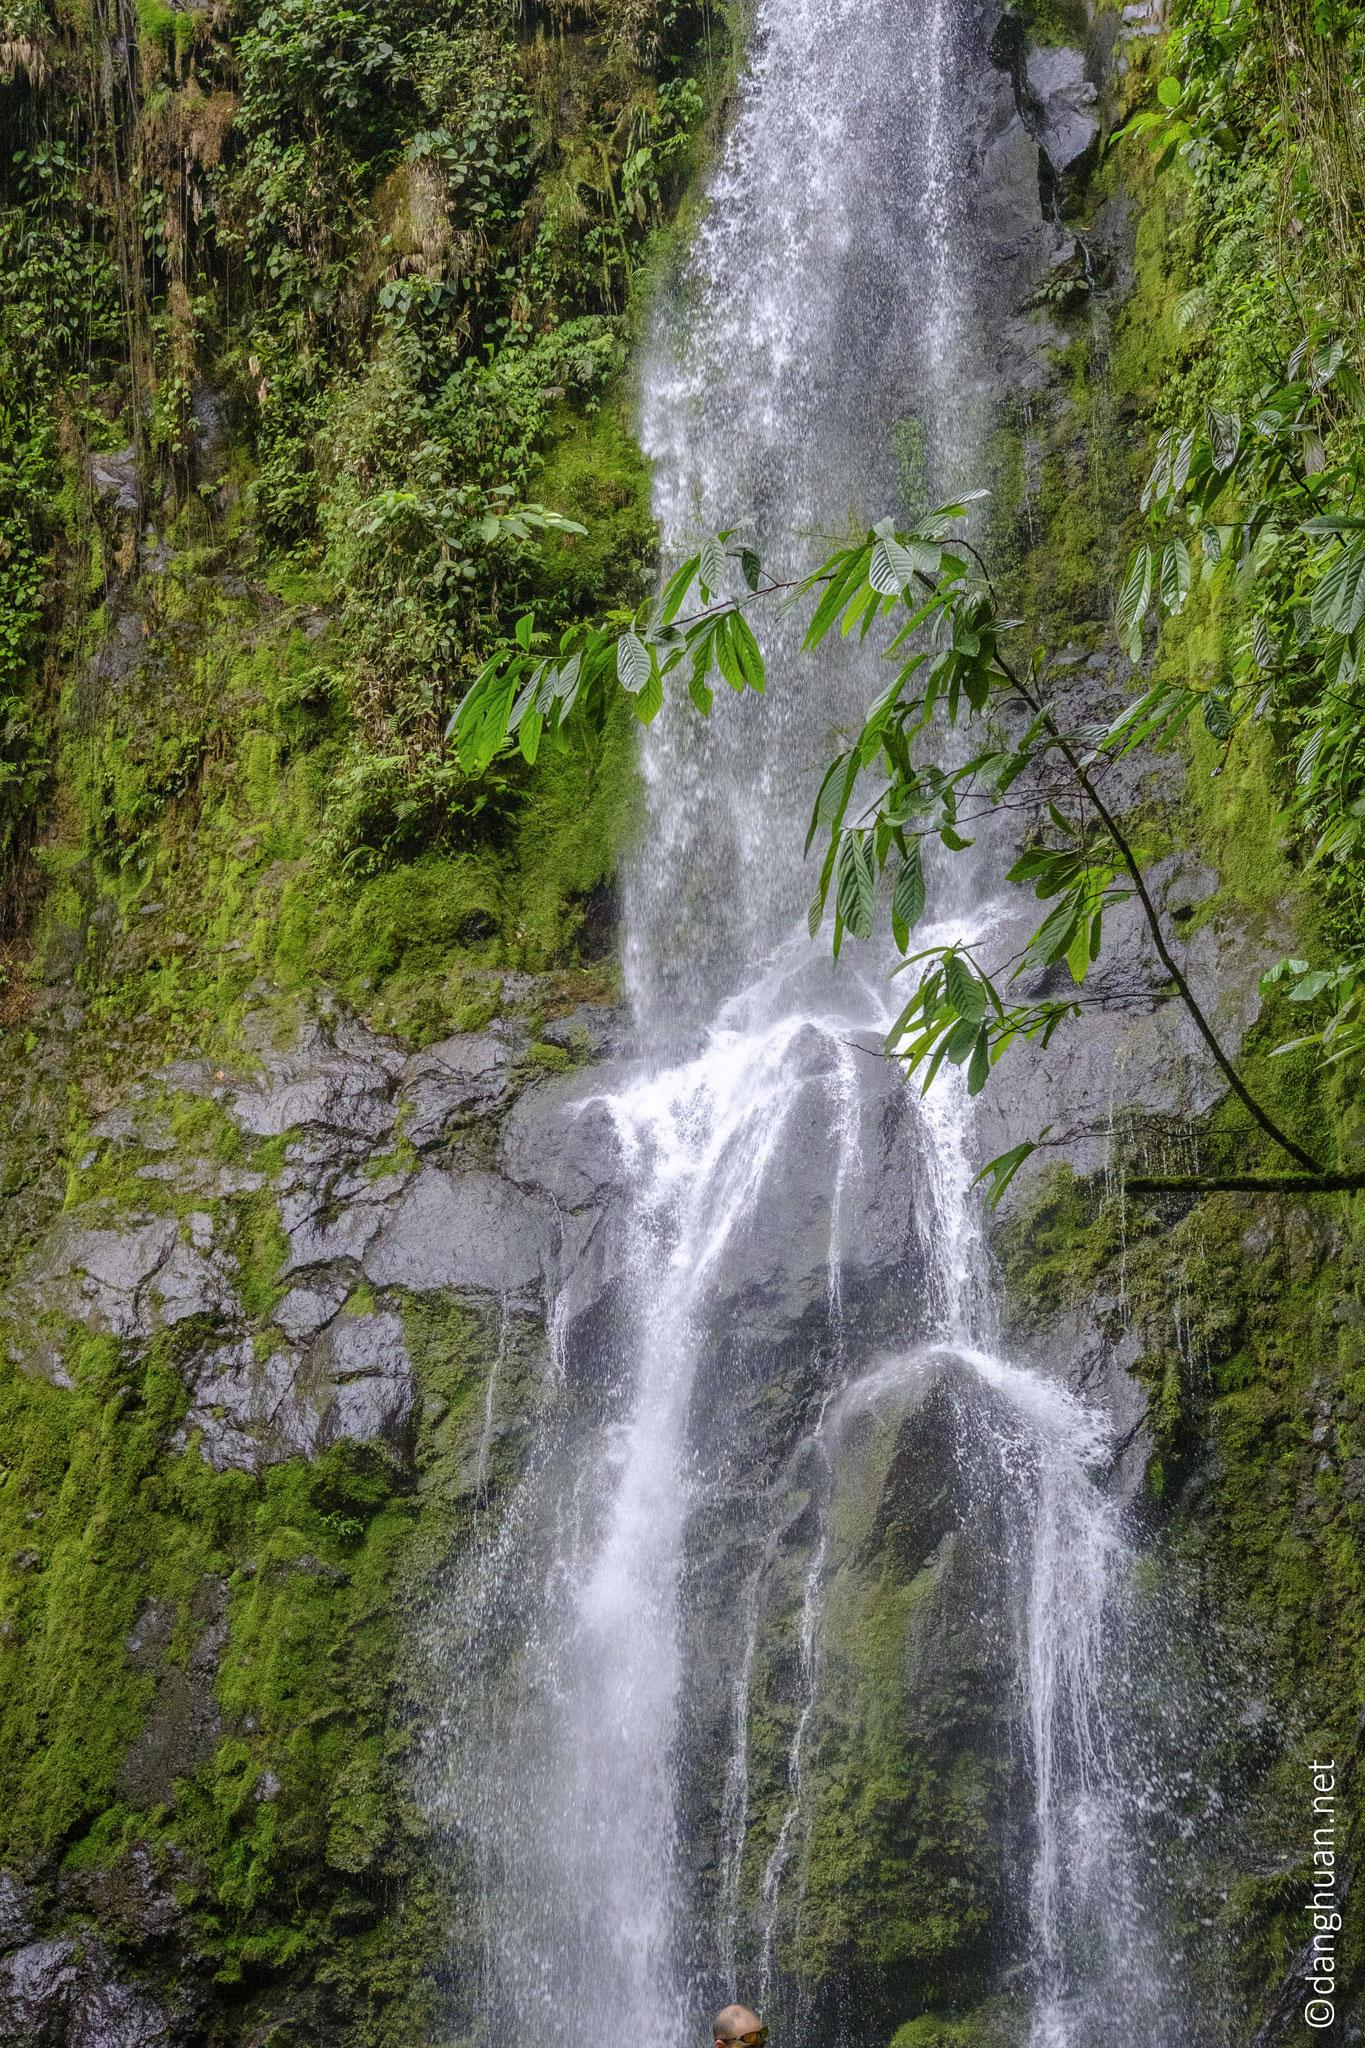 La chute d'eau El Burrito dans El Parque de ninos, la plus grande réserve (23 K hectares)  de Costa Rica